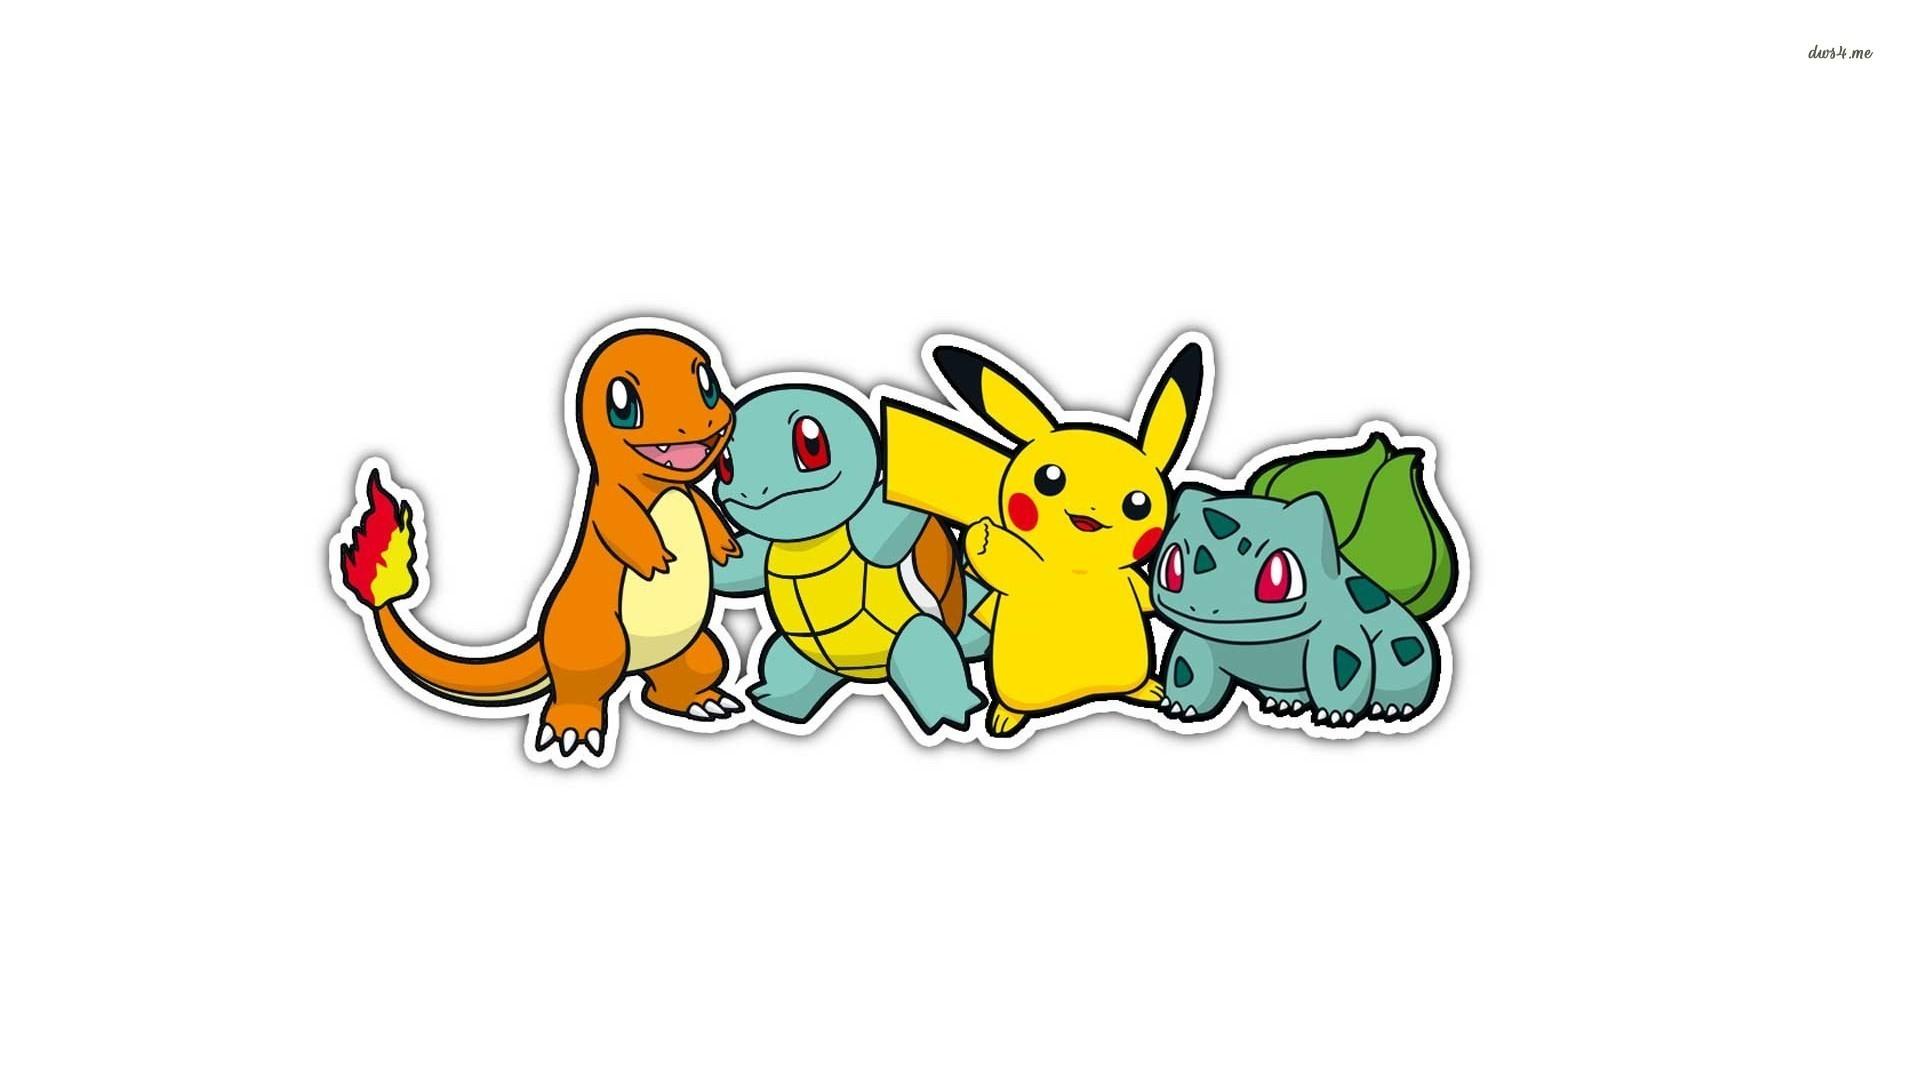 Wallpaper Pokemon (82 Wallpapers)